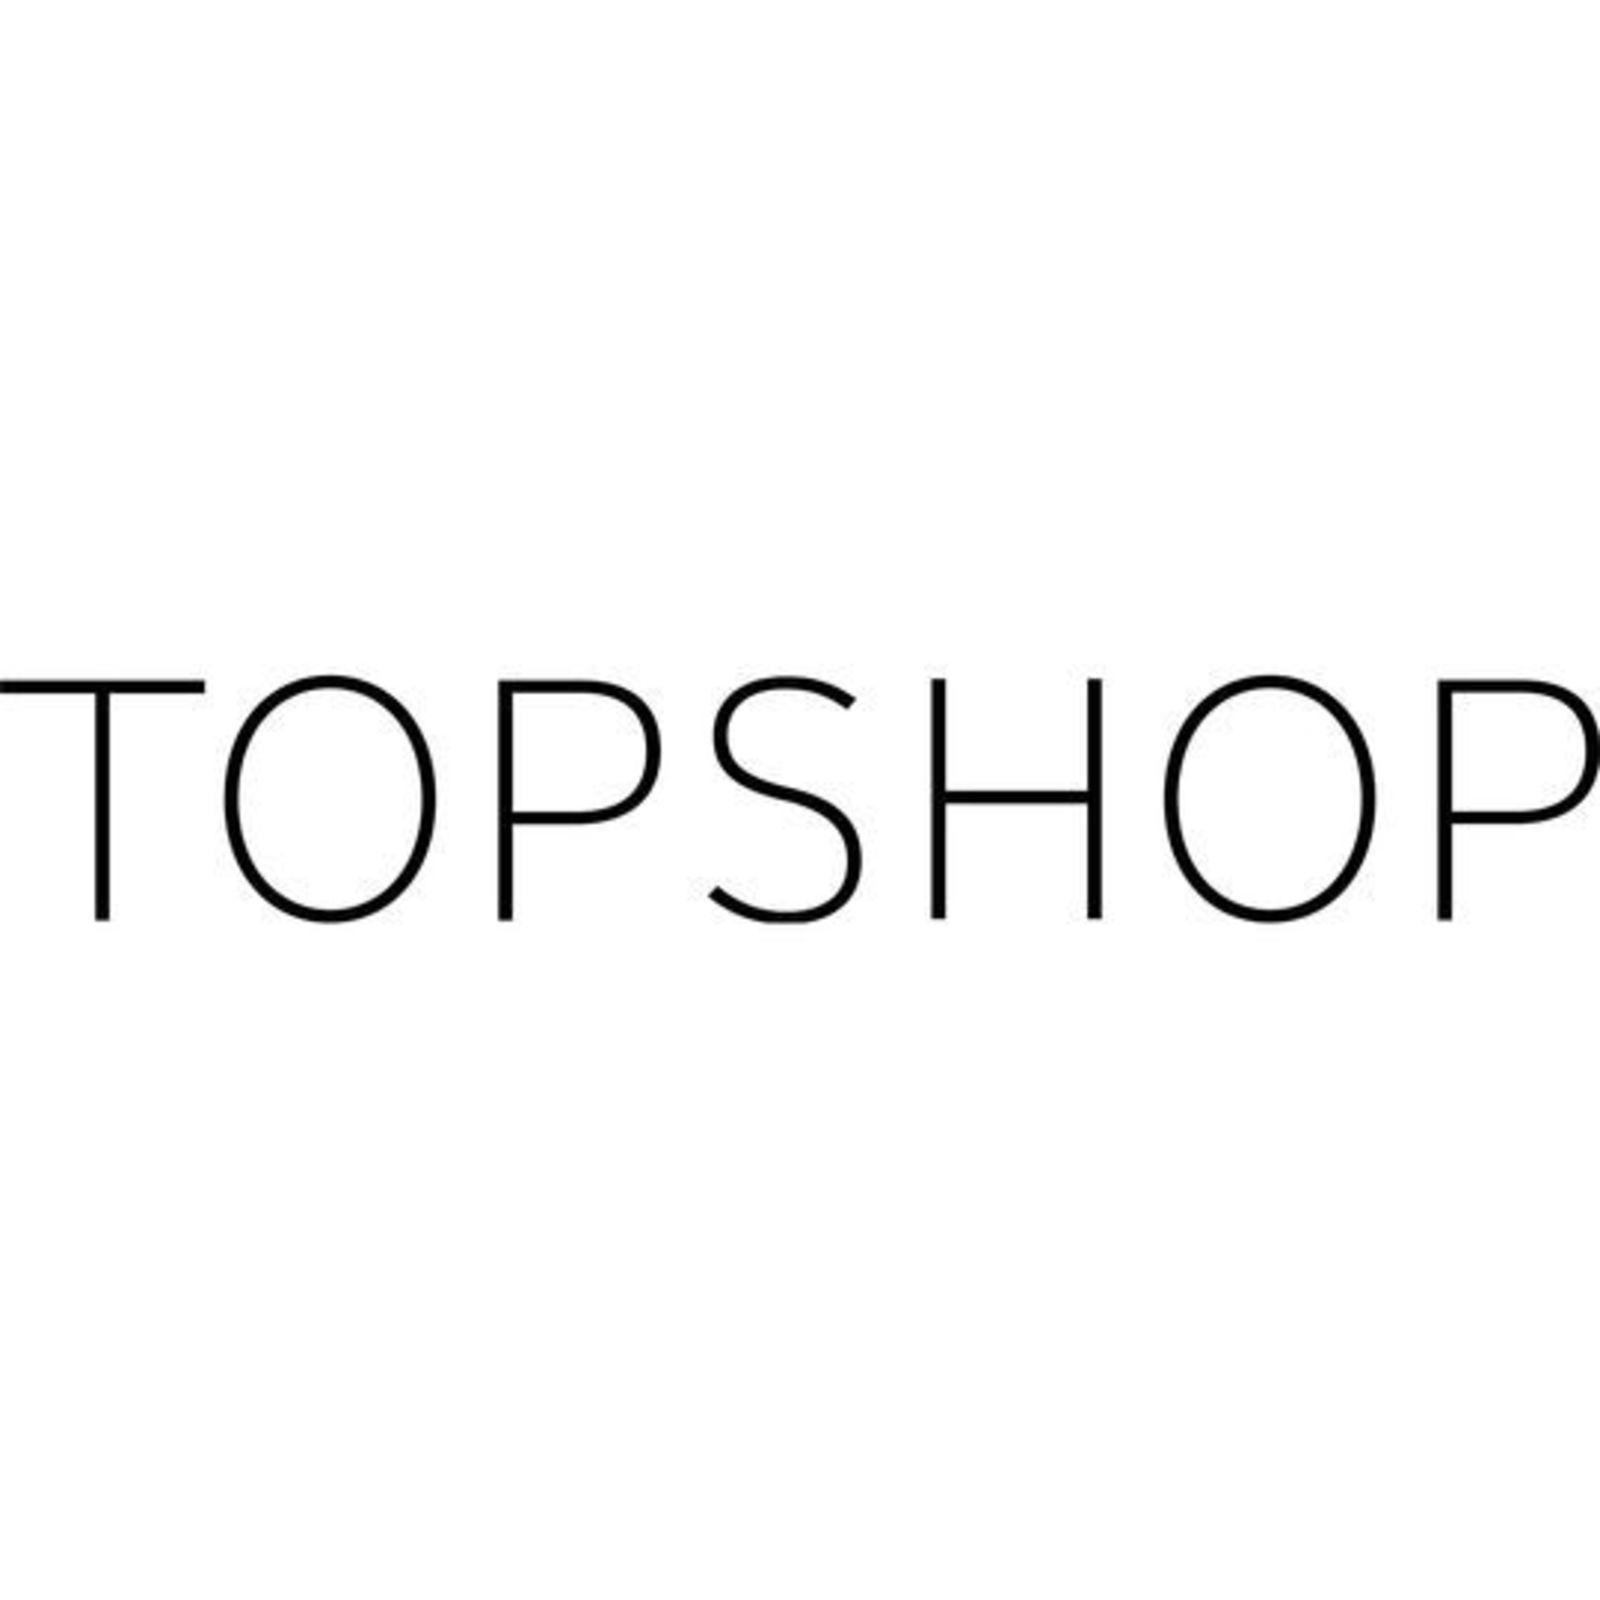 Топ-шоп интернет магазин Модные бренды аксессуаров